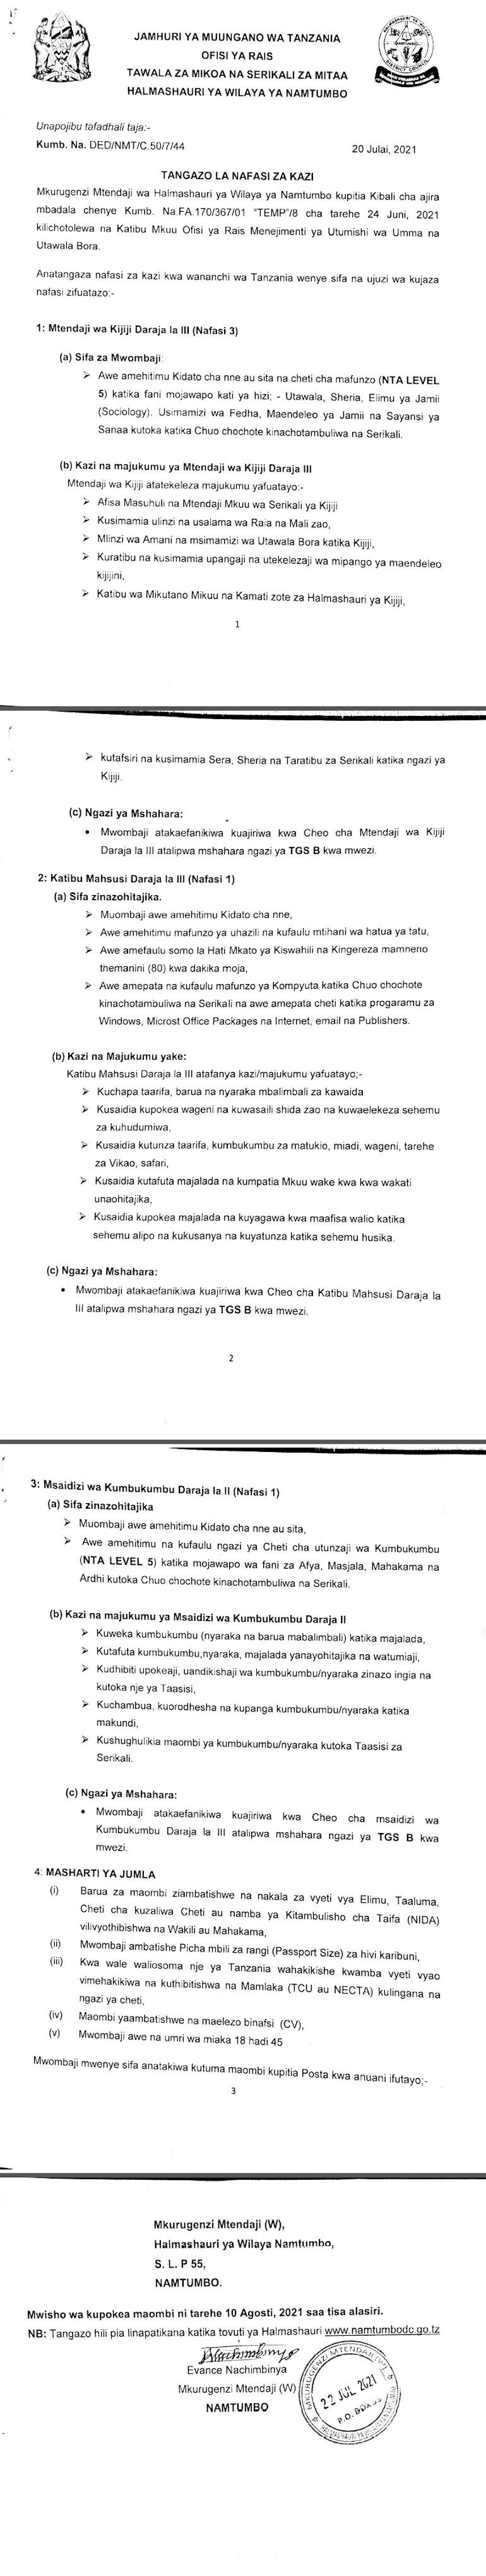 Executive Officers WATENDAJI at Namtumbo District Council July 2021